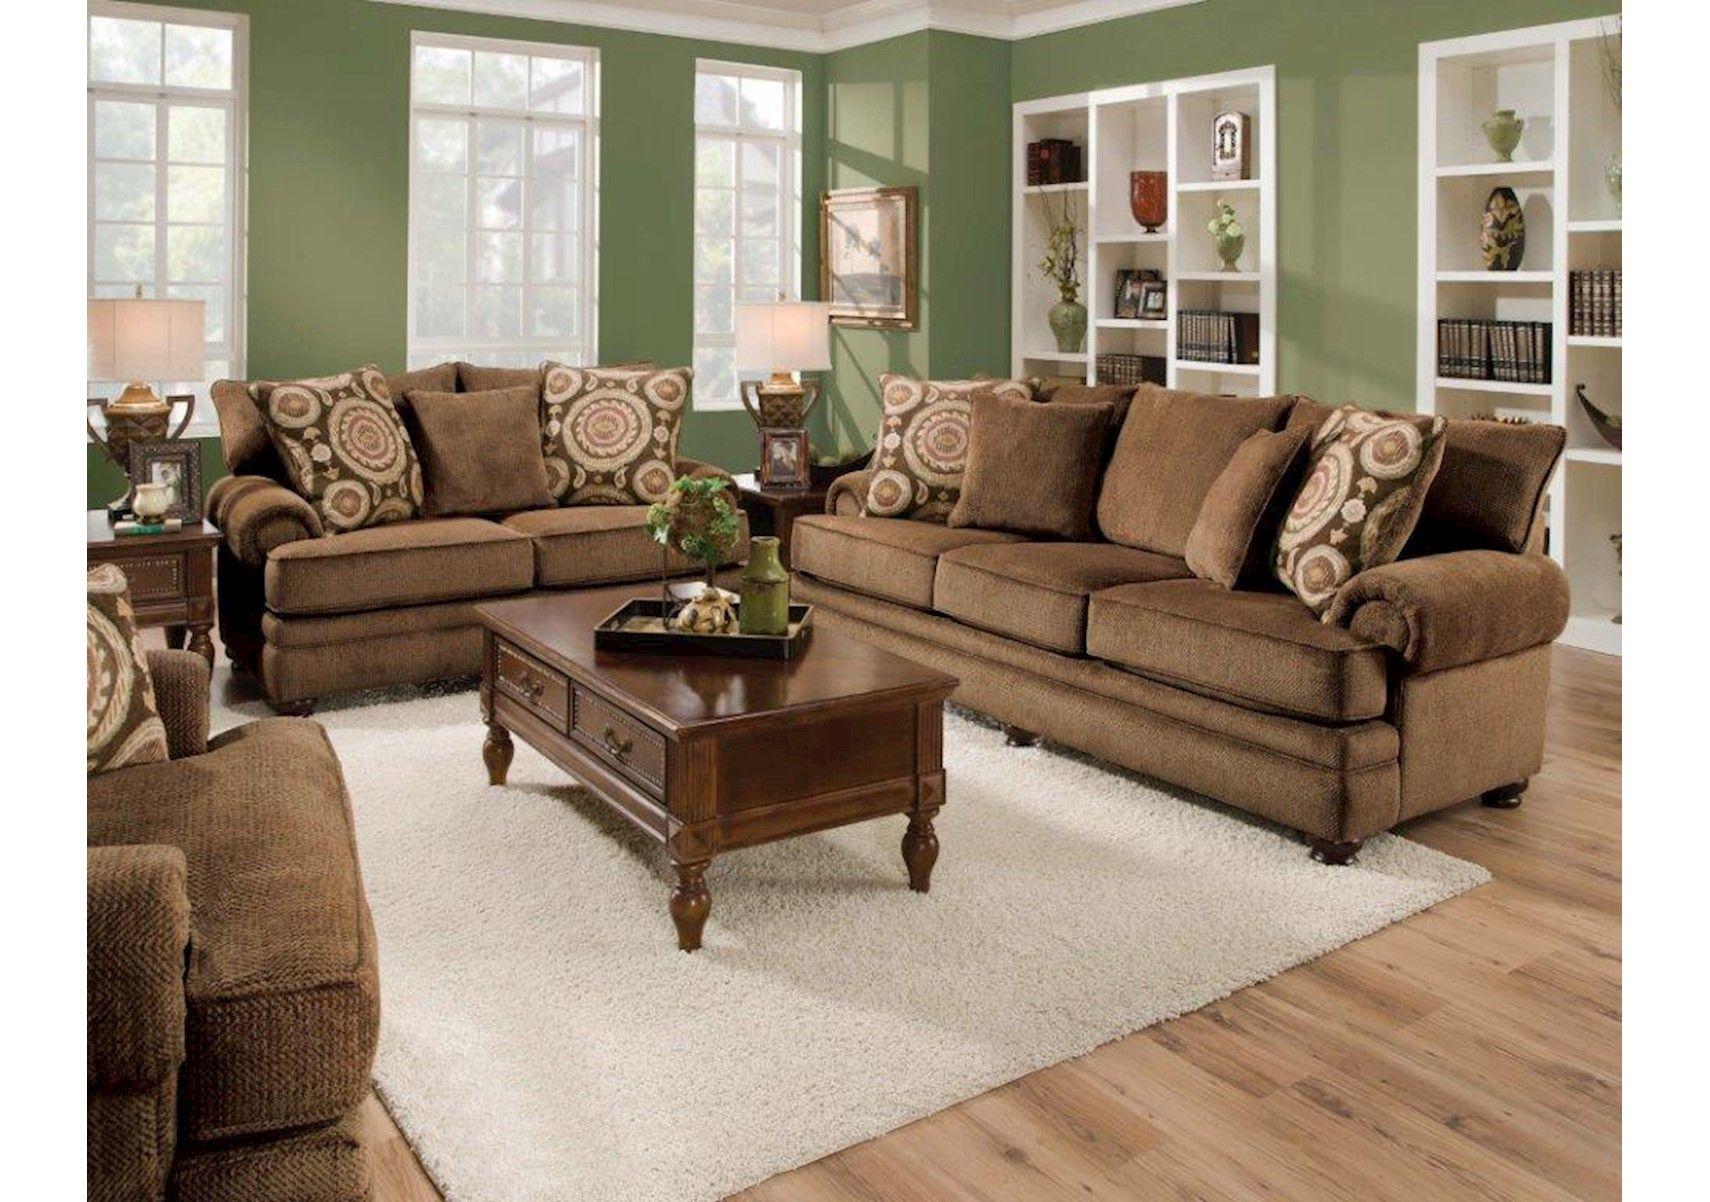 Lacks | Twill Chocolate 2 Pc Living Room Set